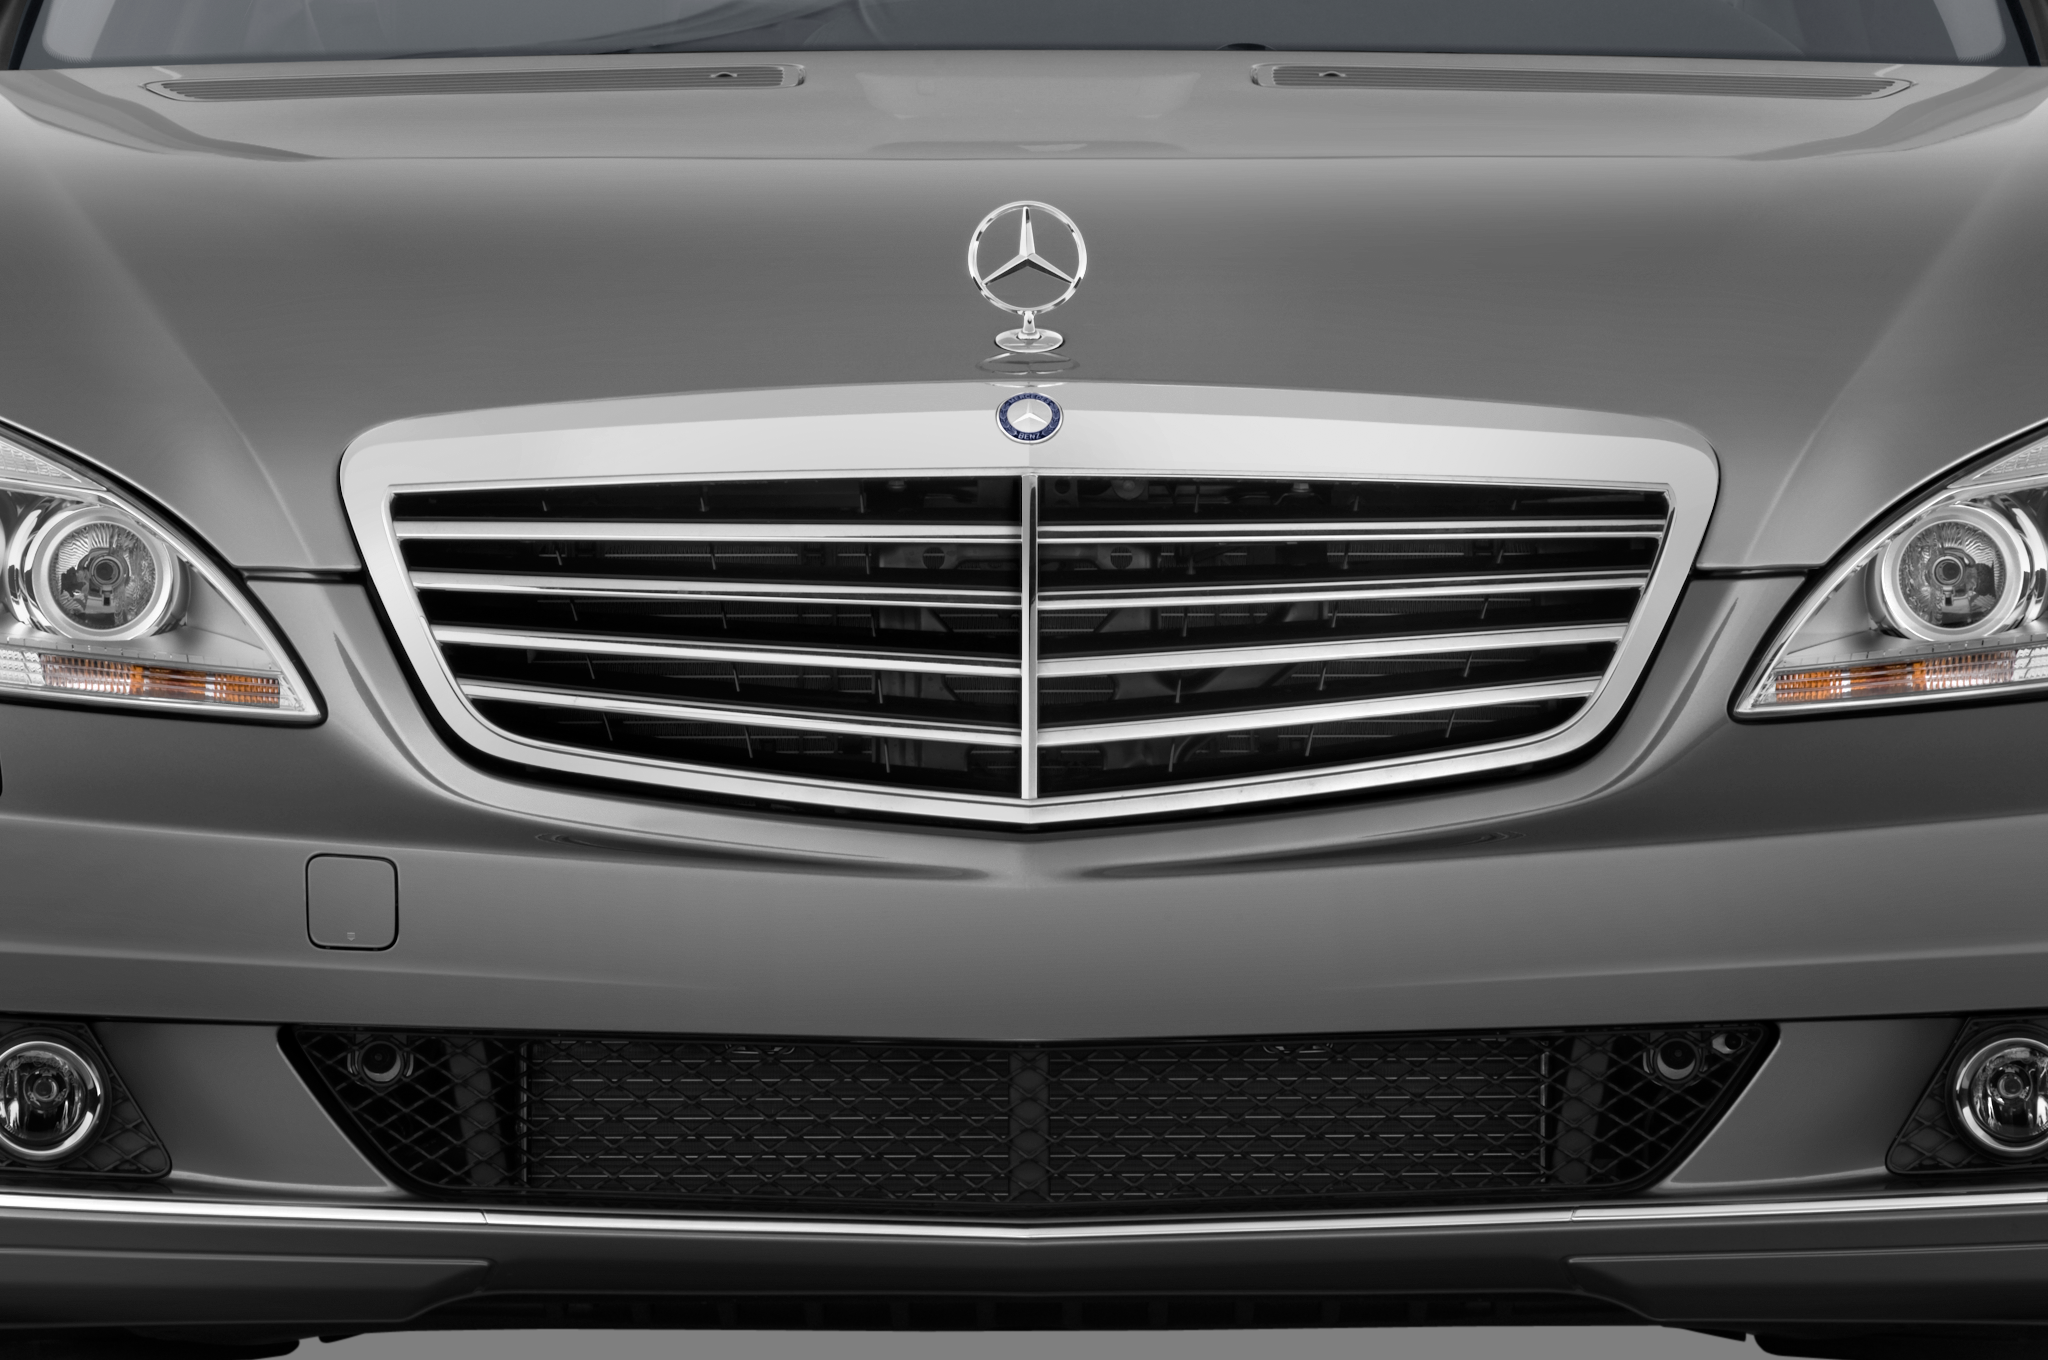 2011 mercedes benz s550 4matic automobile magazine for 2011 mercedes benz e350 grill